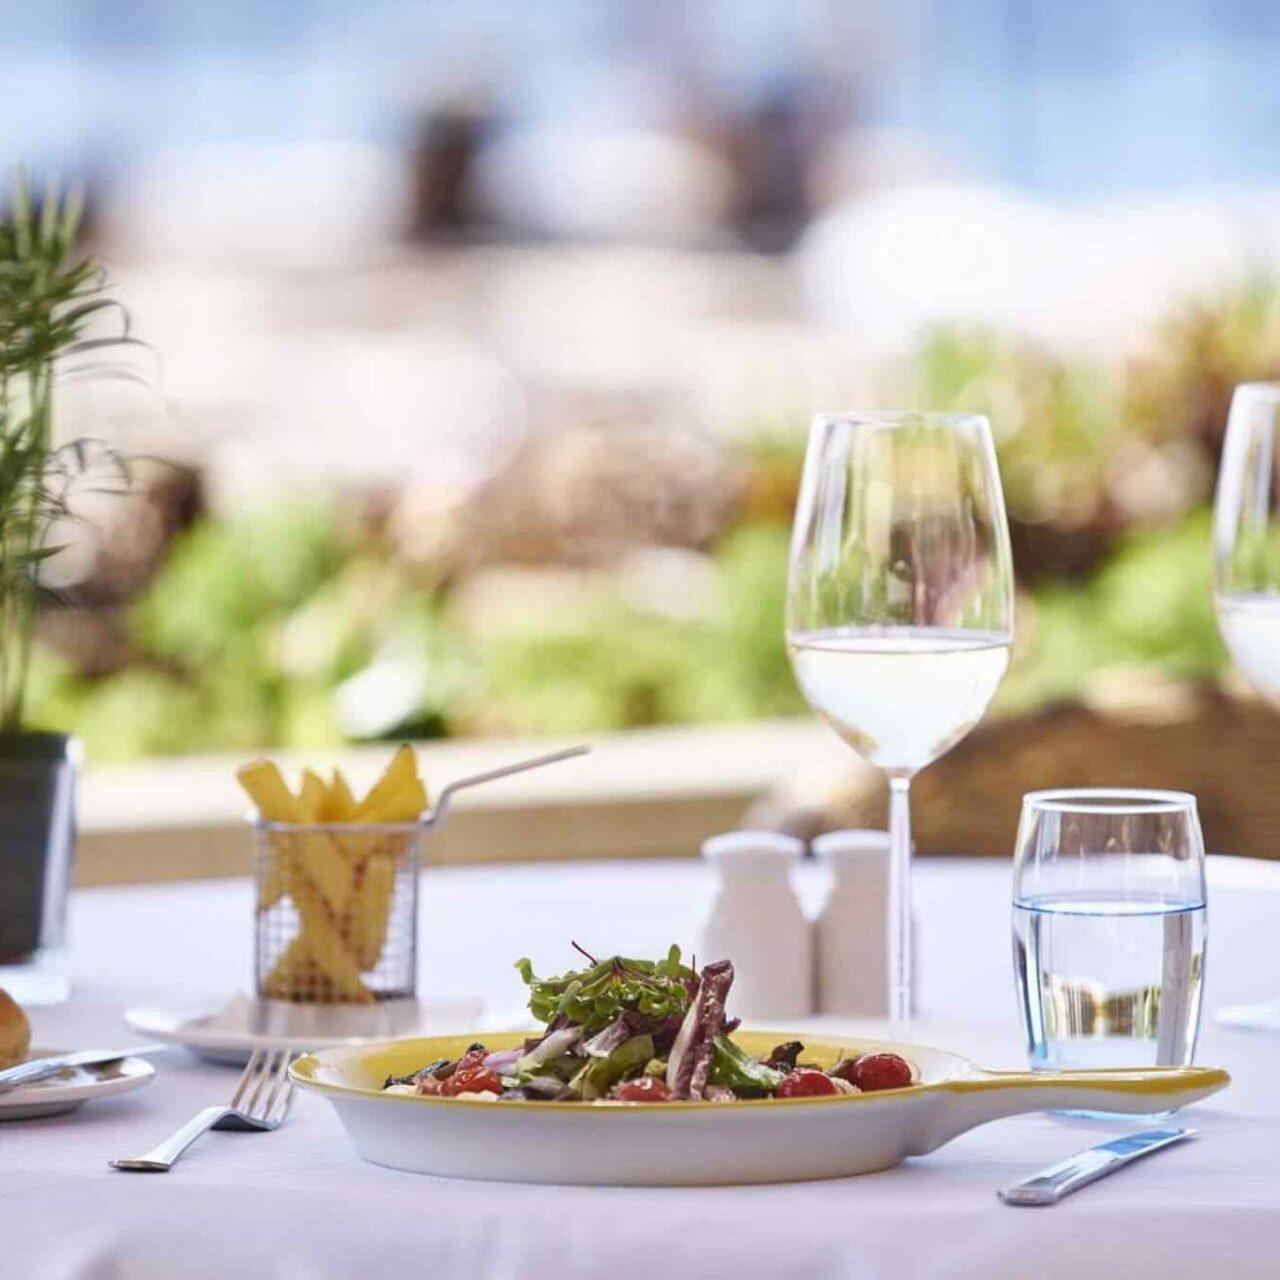 https://bbqterkep.hu/wp-content/uploads/2017/08/restaurant-01-6-1280x1280.jpg